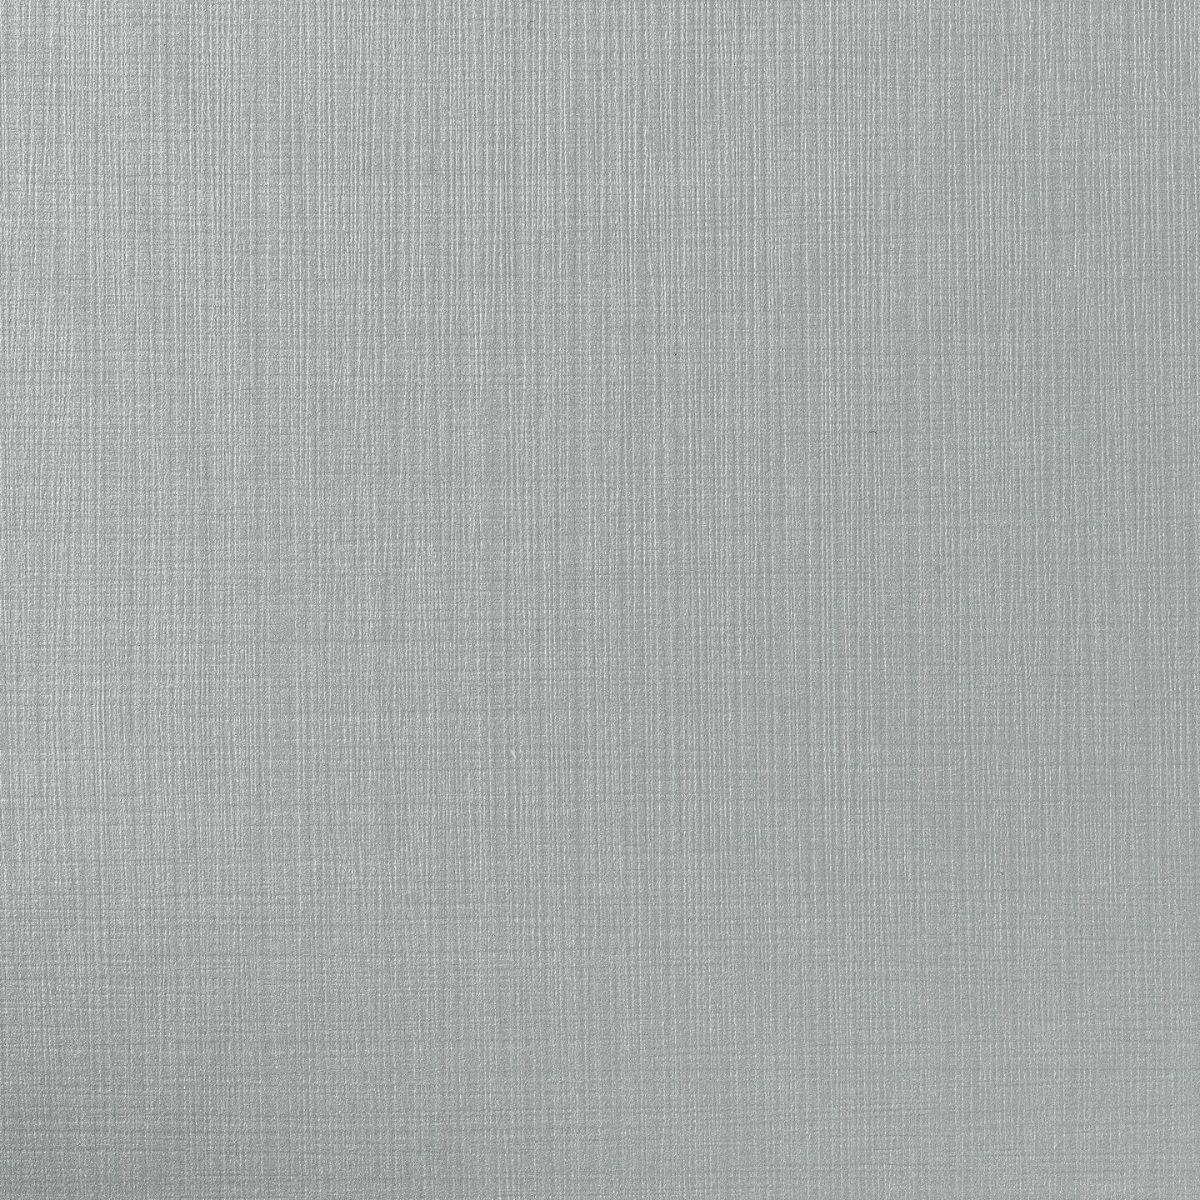 Finish aluminum panels penelope for glass wall